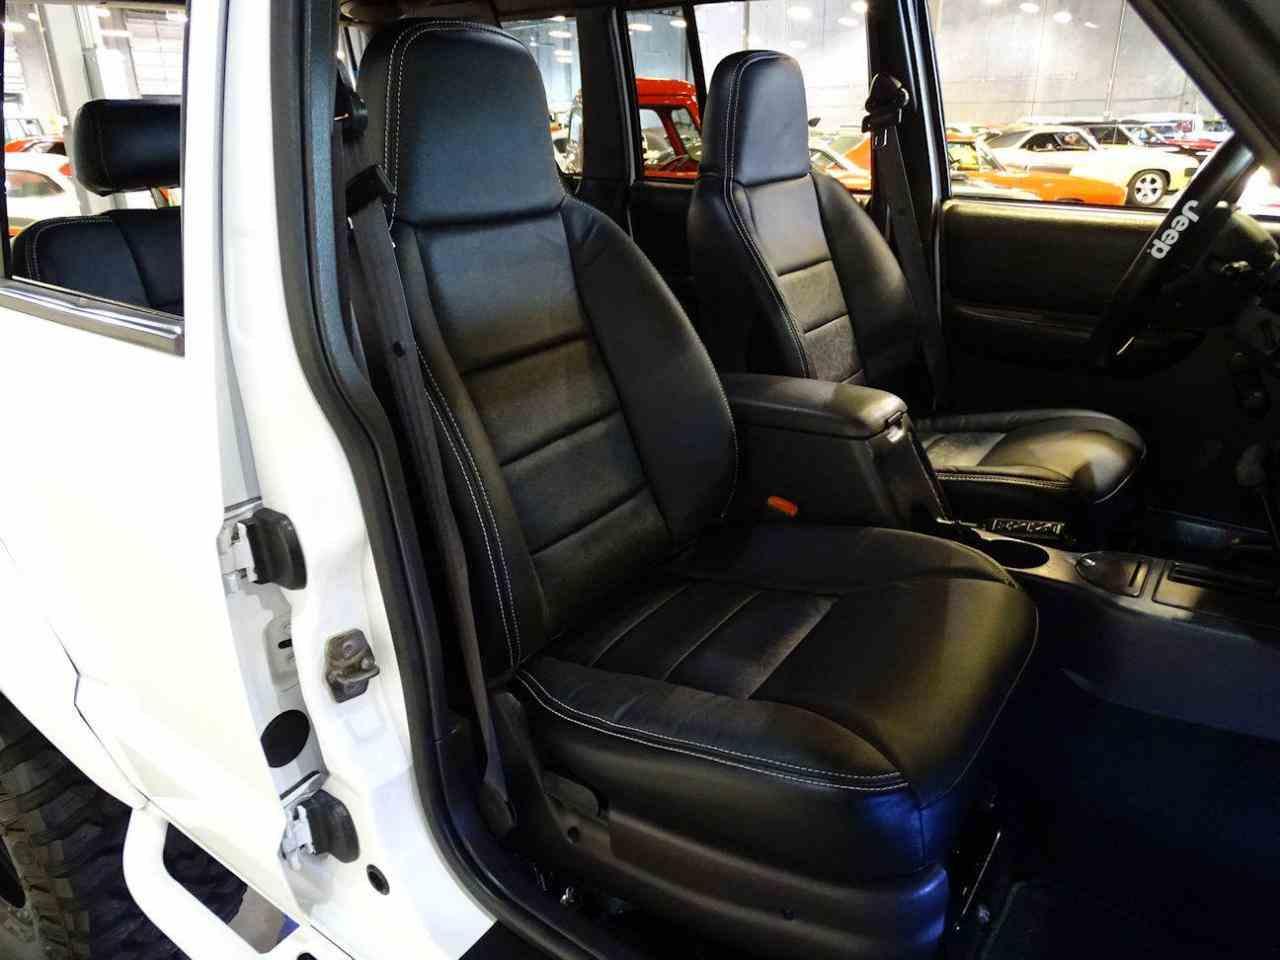 drop with doorless kb xj jeep views adjustment mod cherokee in size forum name